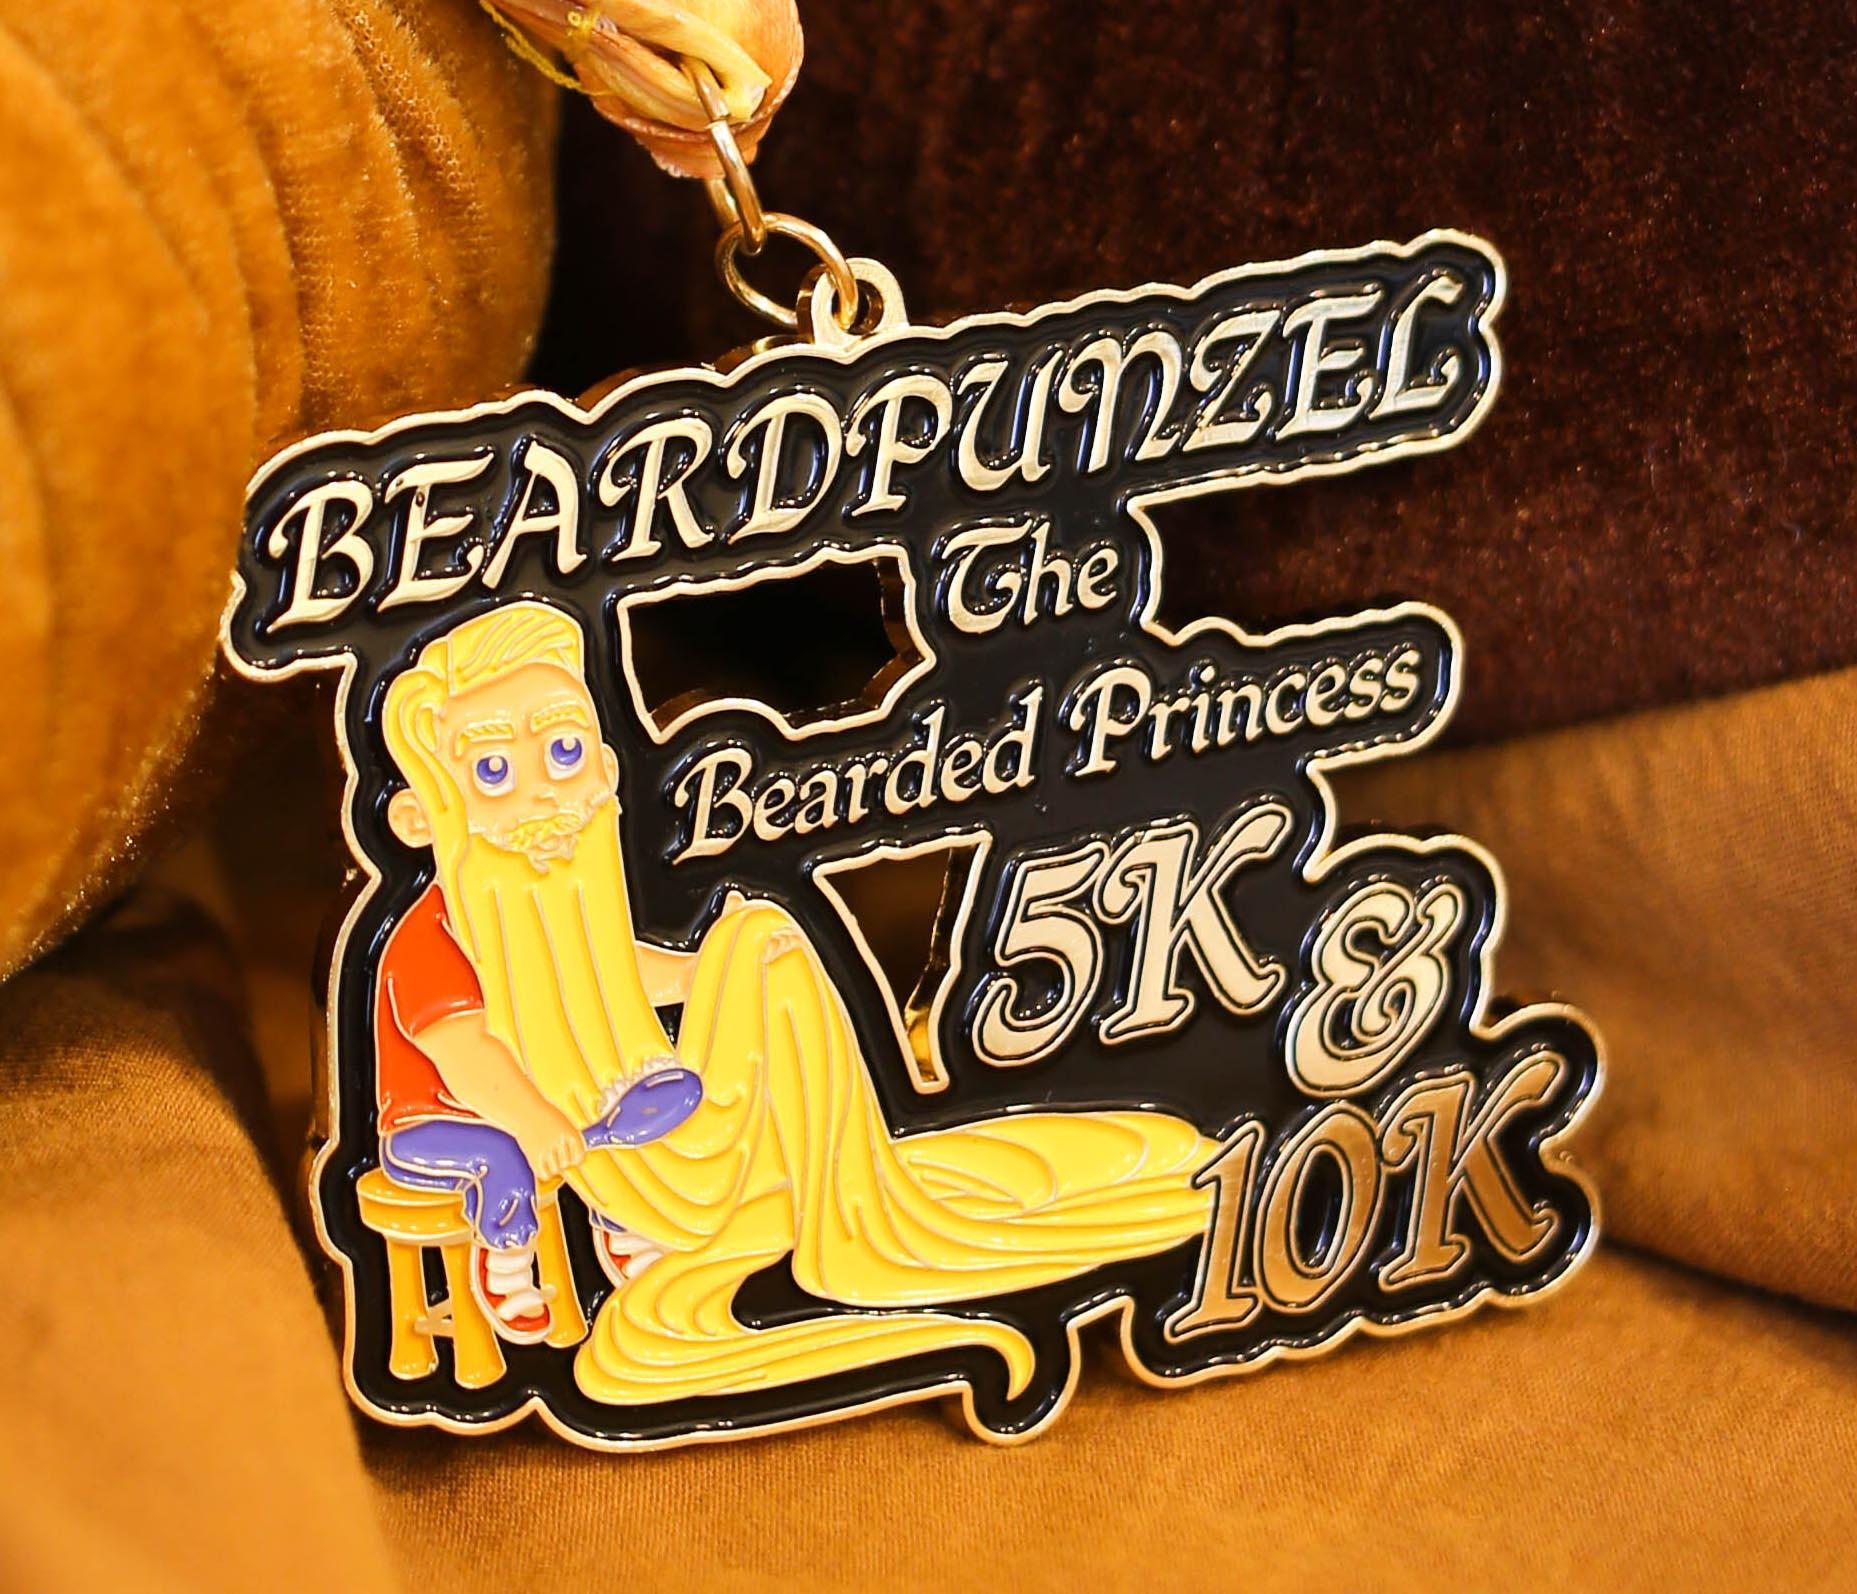 Beardpunzel - The Bearded Princess 5K & 10K -